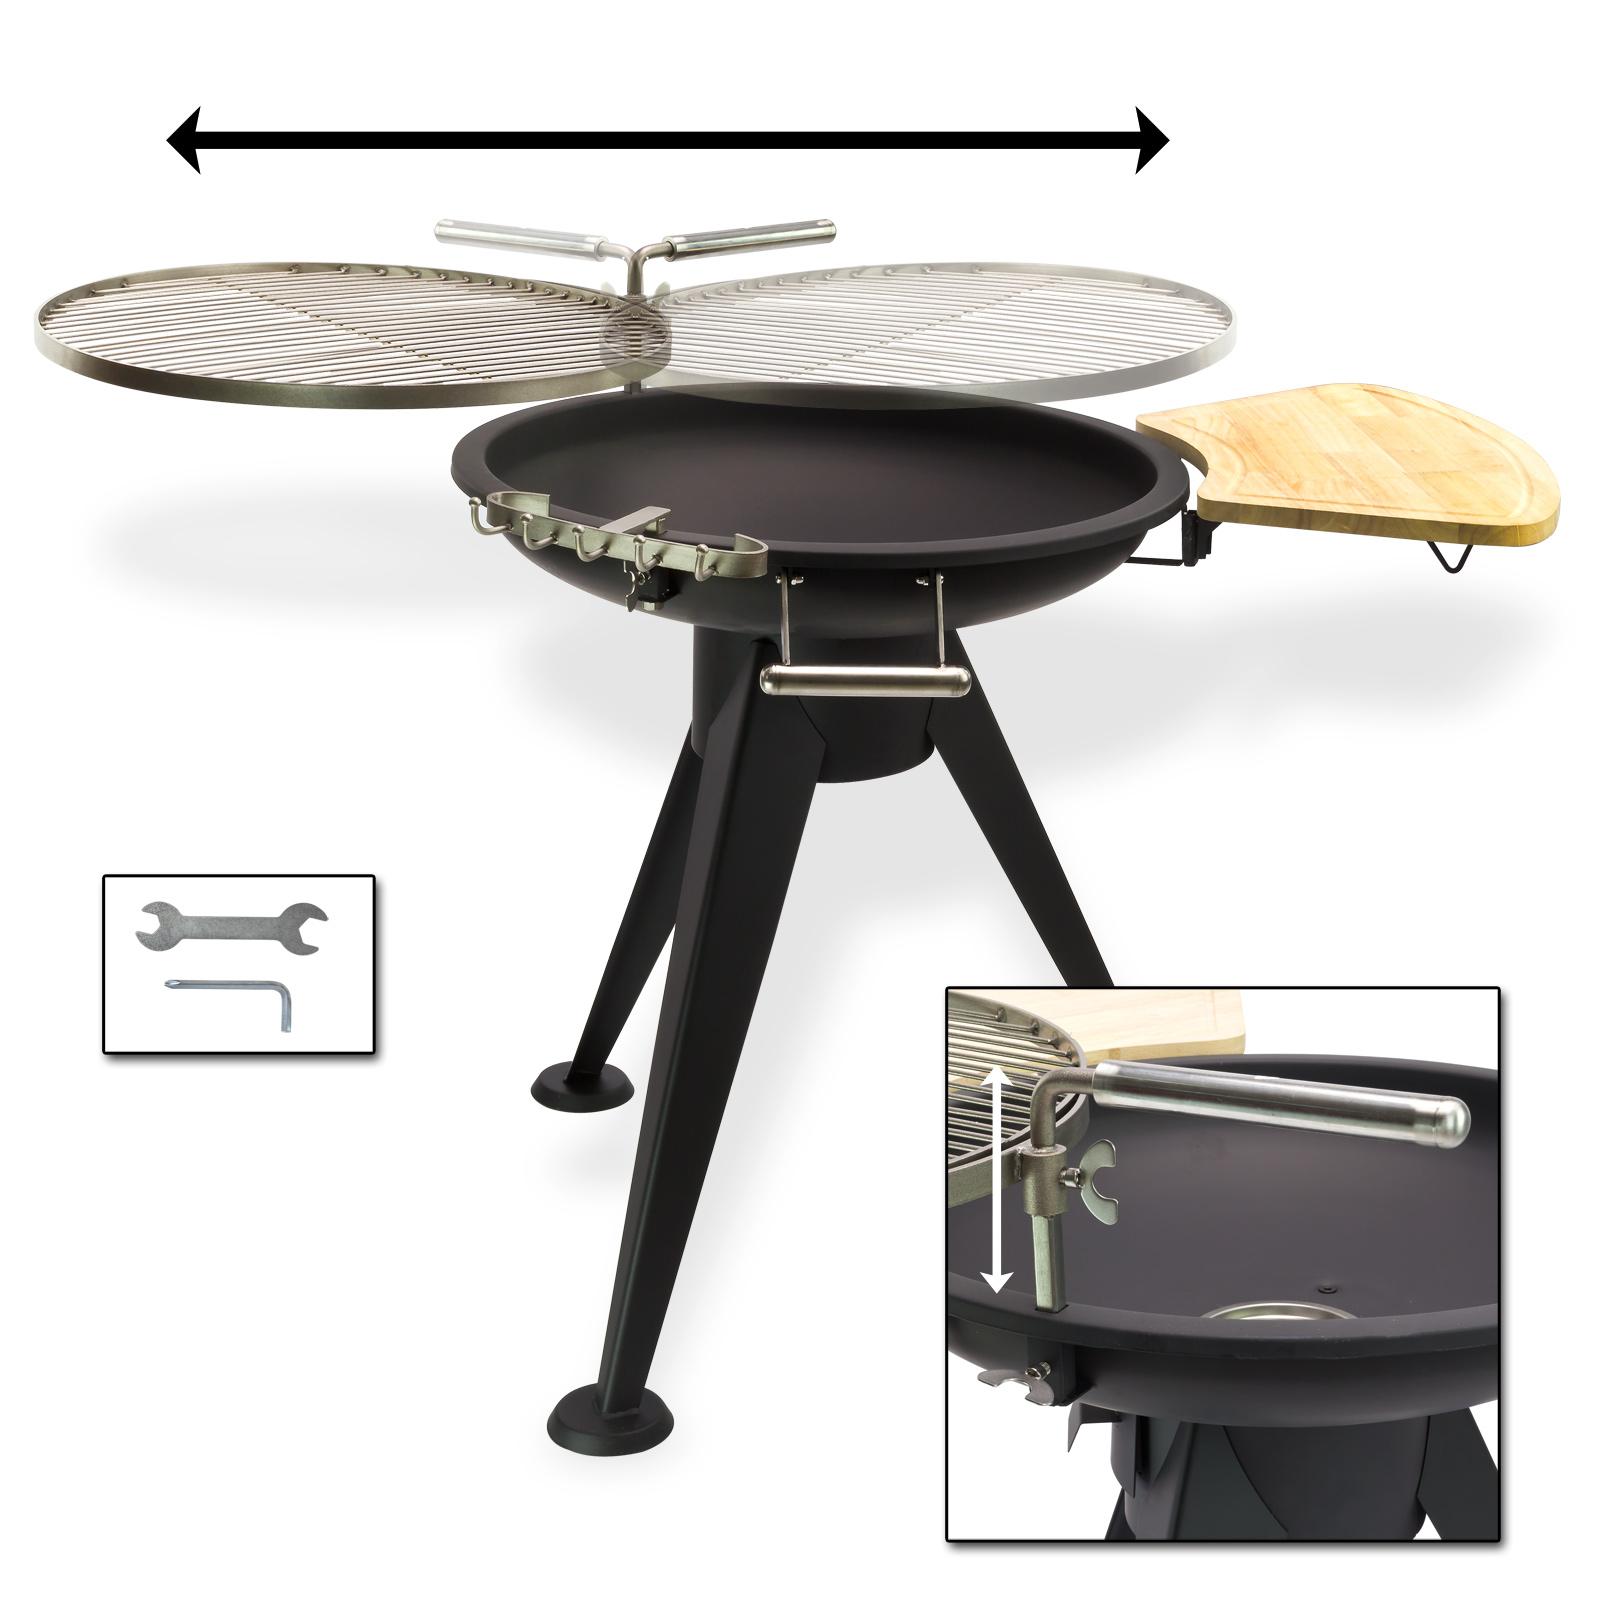 edelstahl rundgrill drehbar holzkohlegrill grill 55 cm ebay. Black Bedroom Furniture Sets. Home Design Ideas